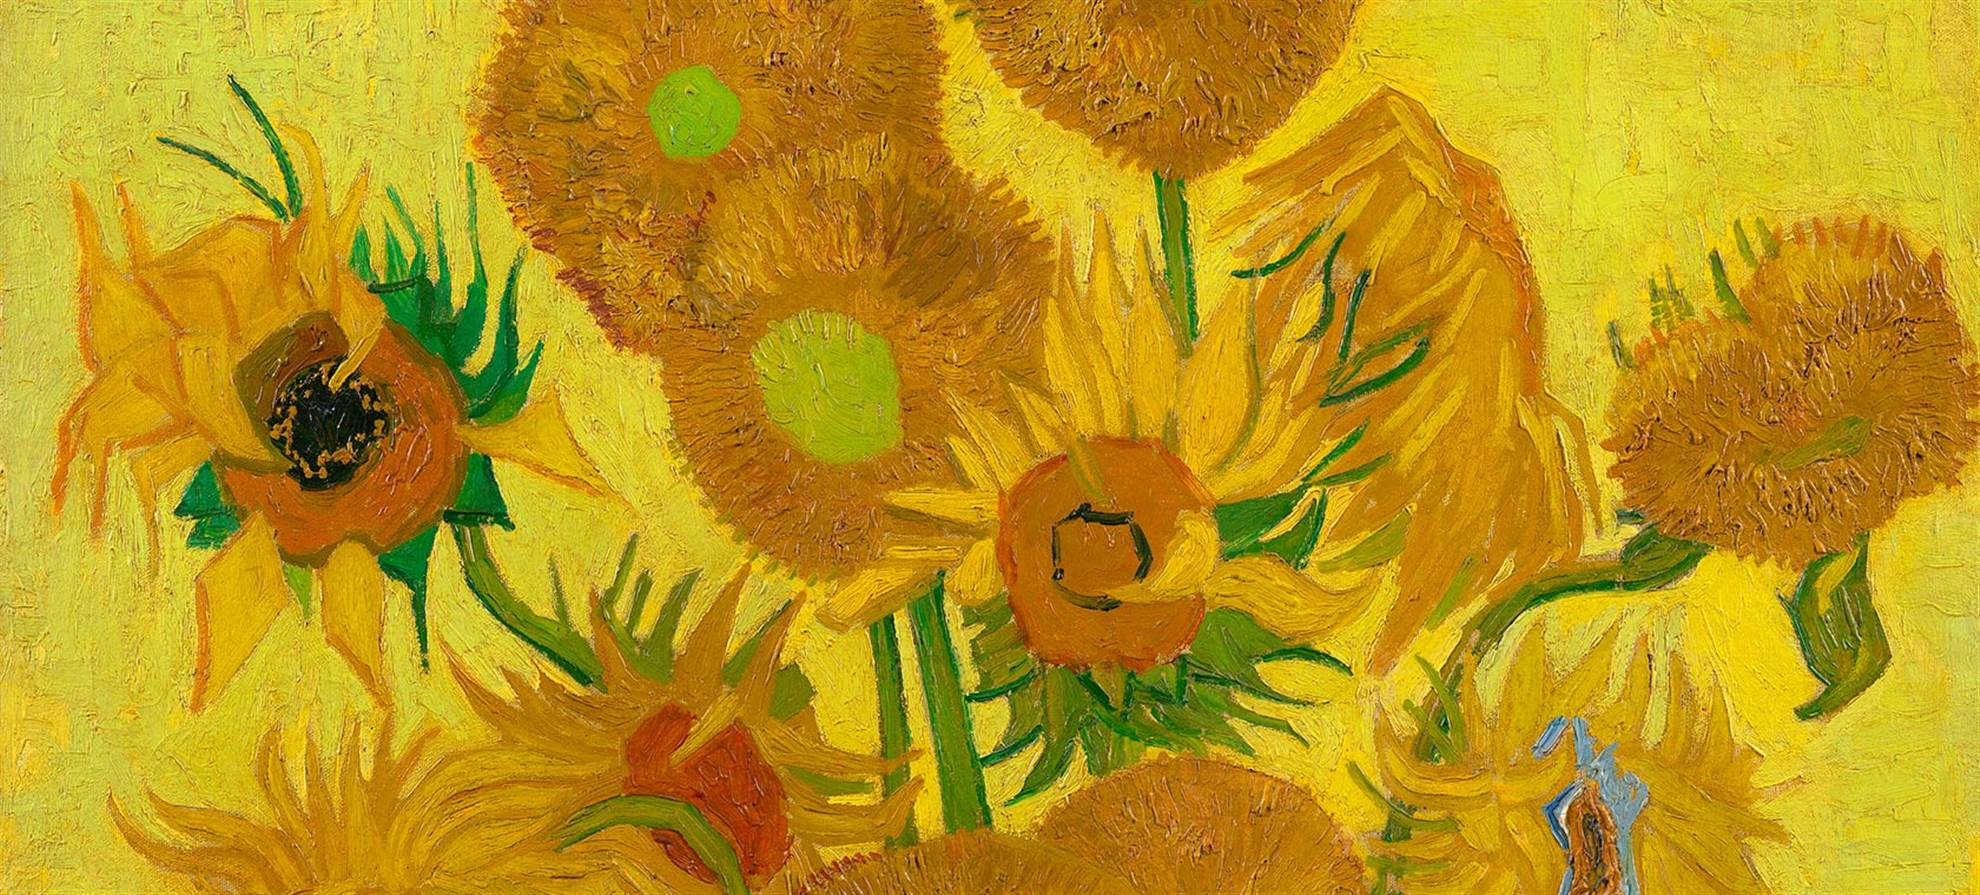 Musée Van Gogh Voie Bleu